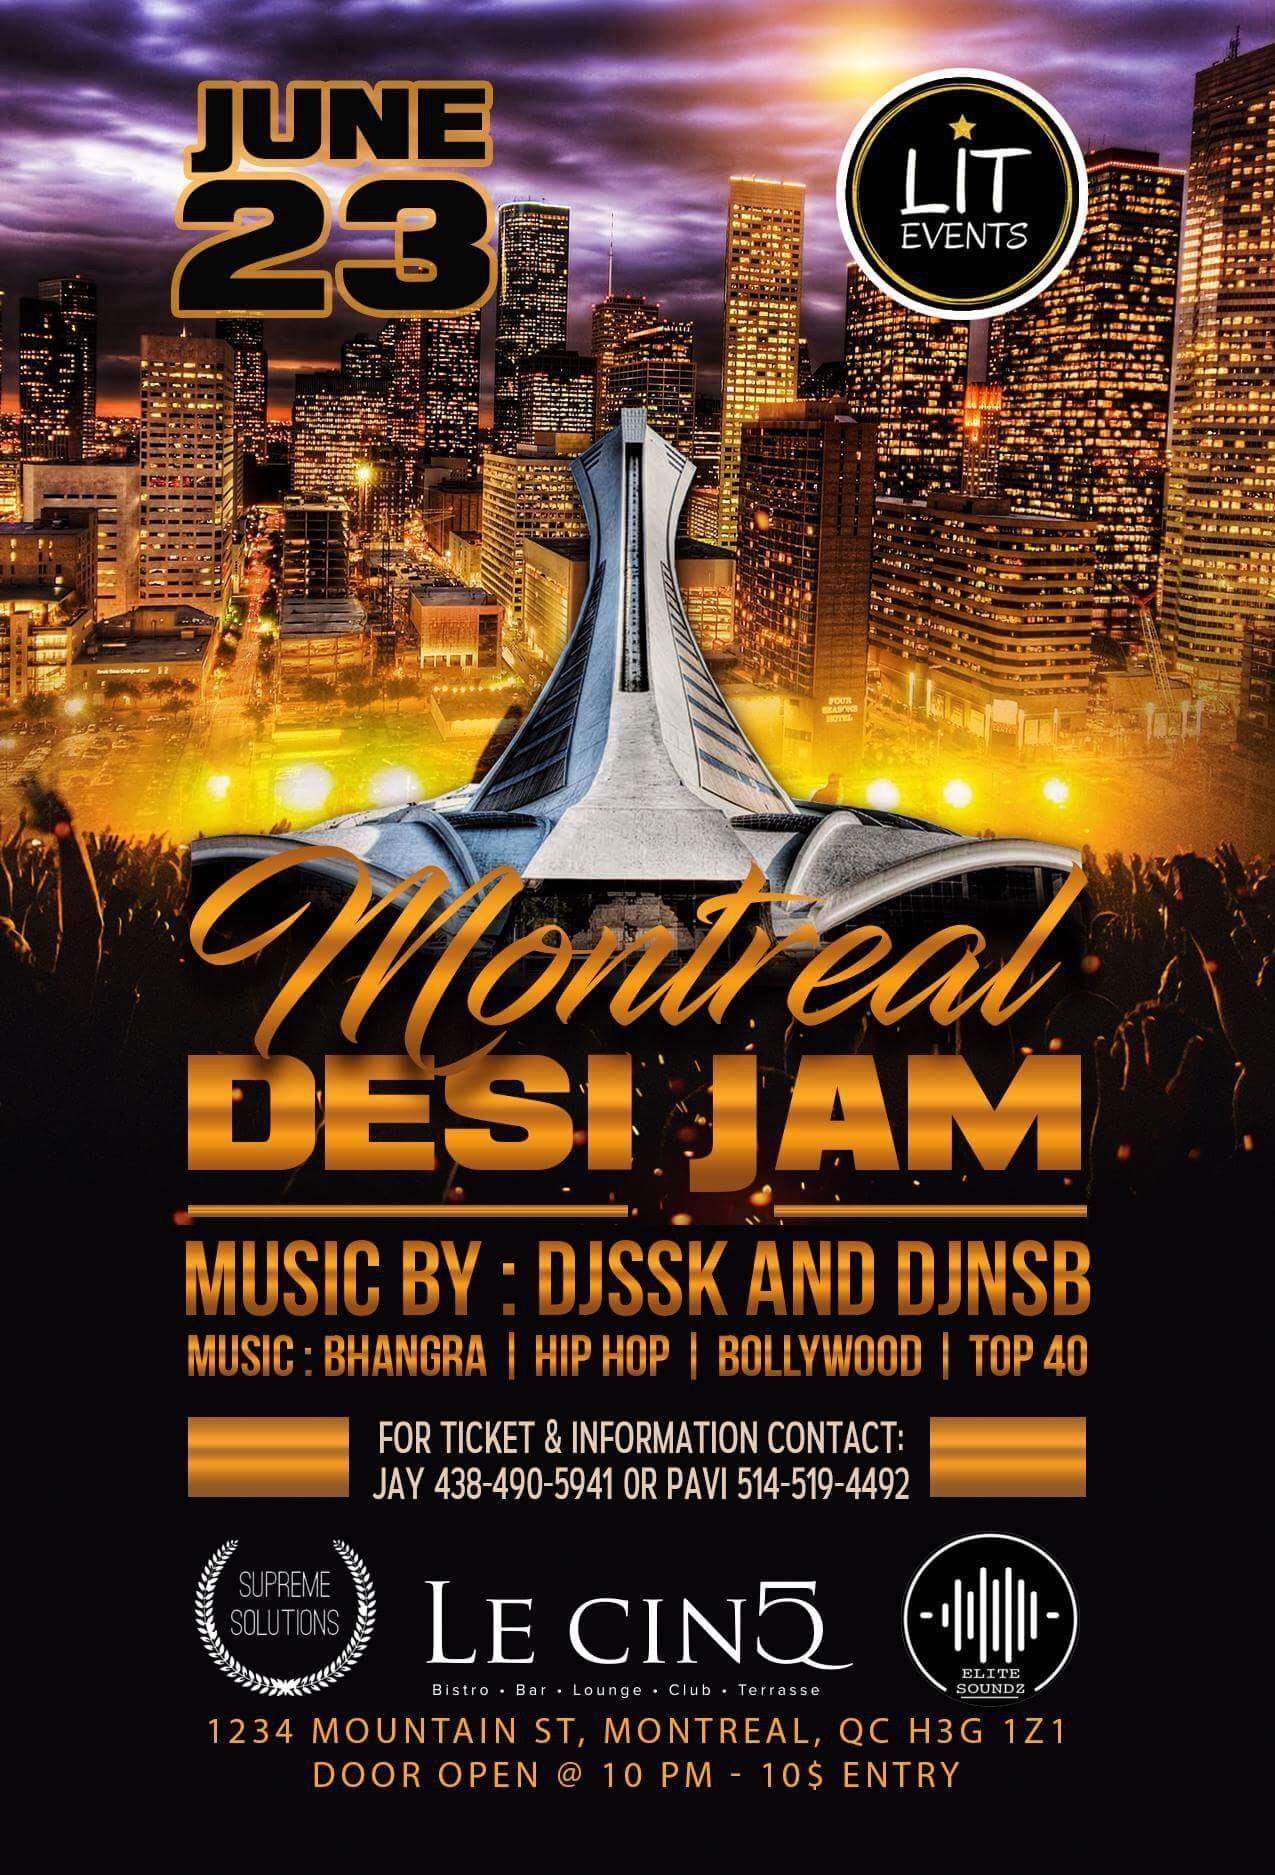 Montreal Desi Jam